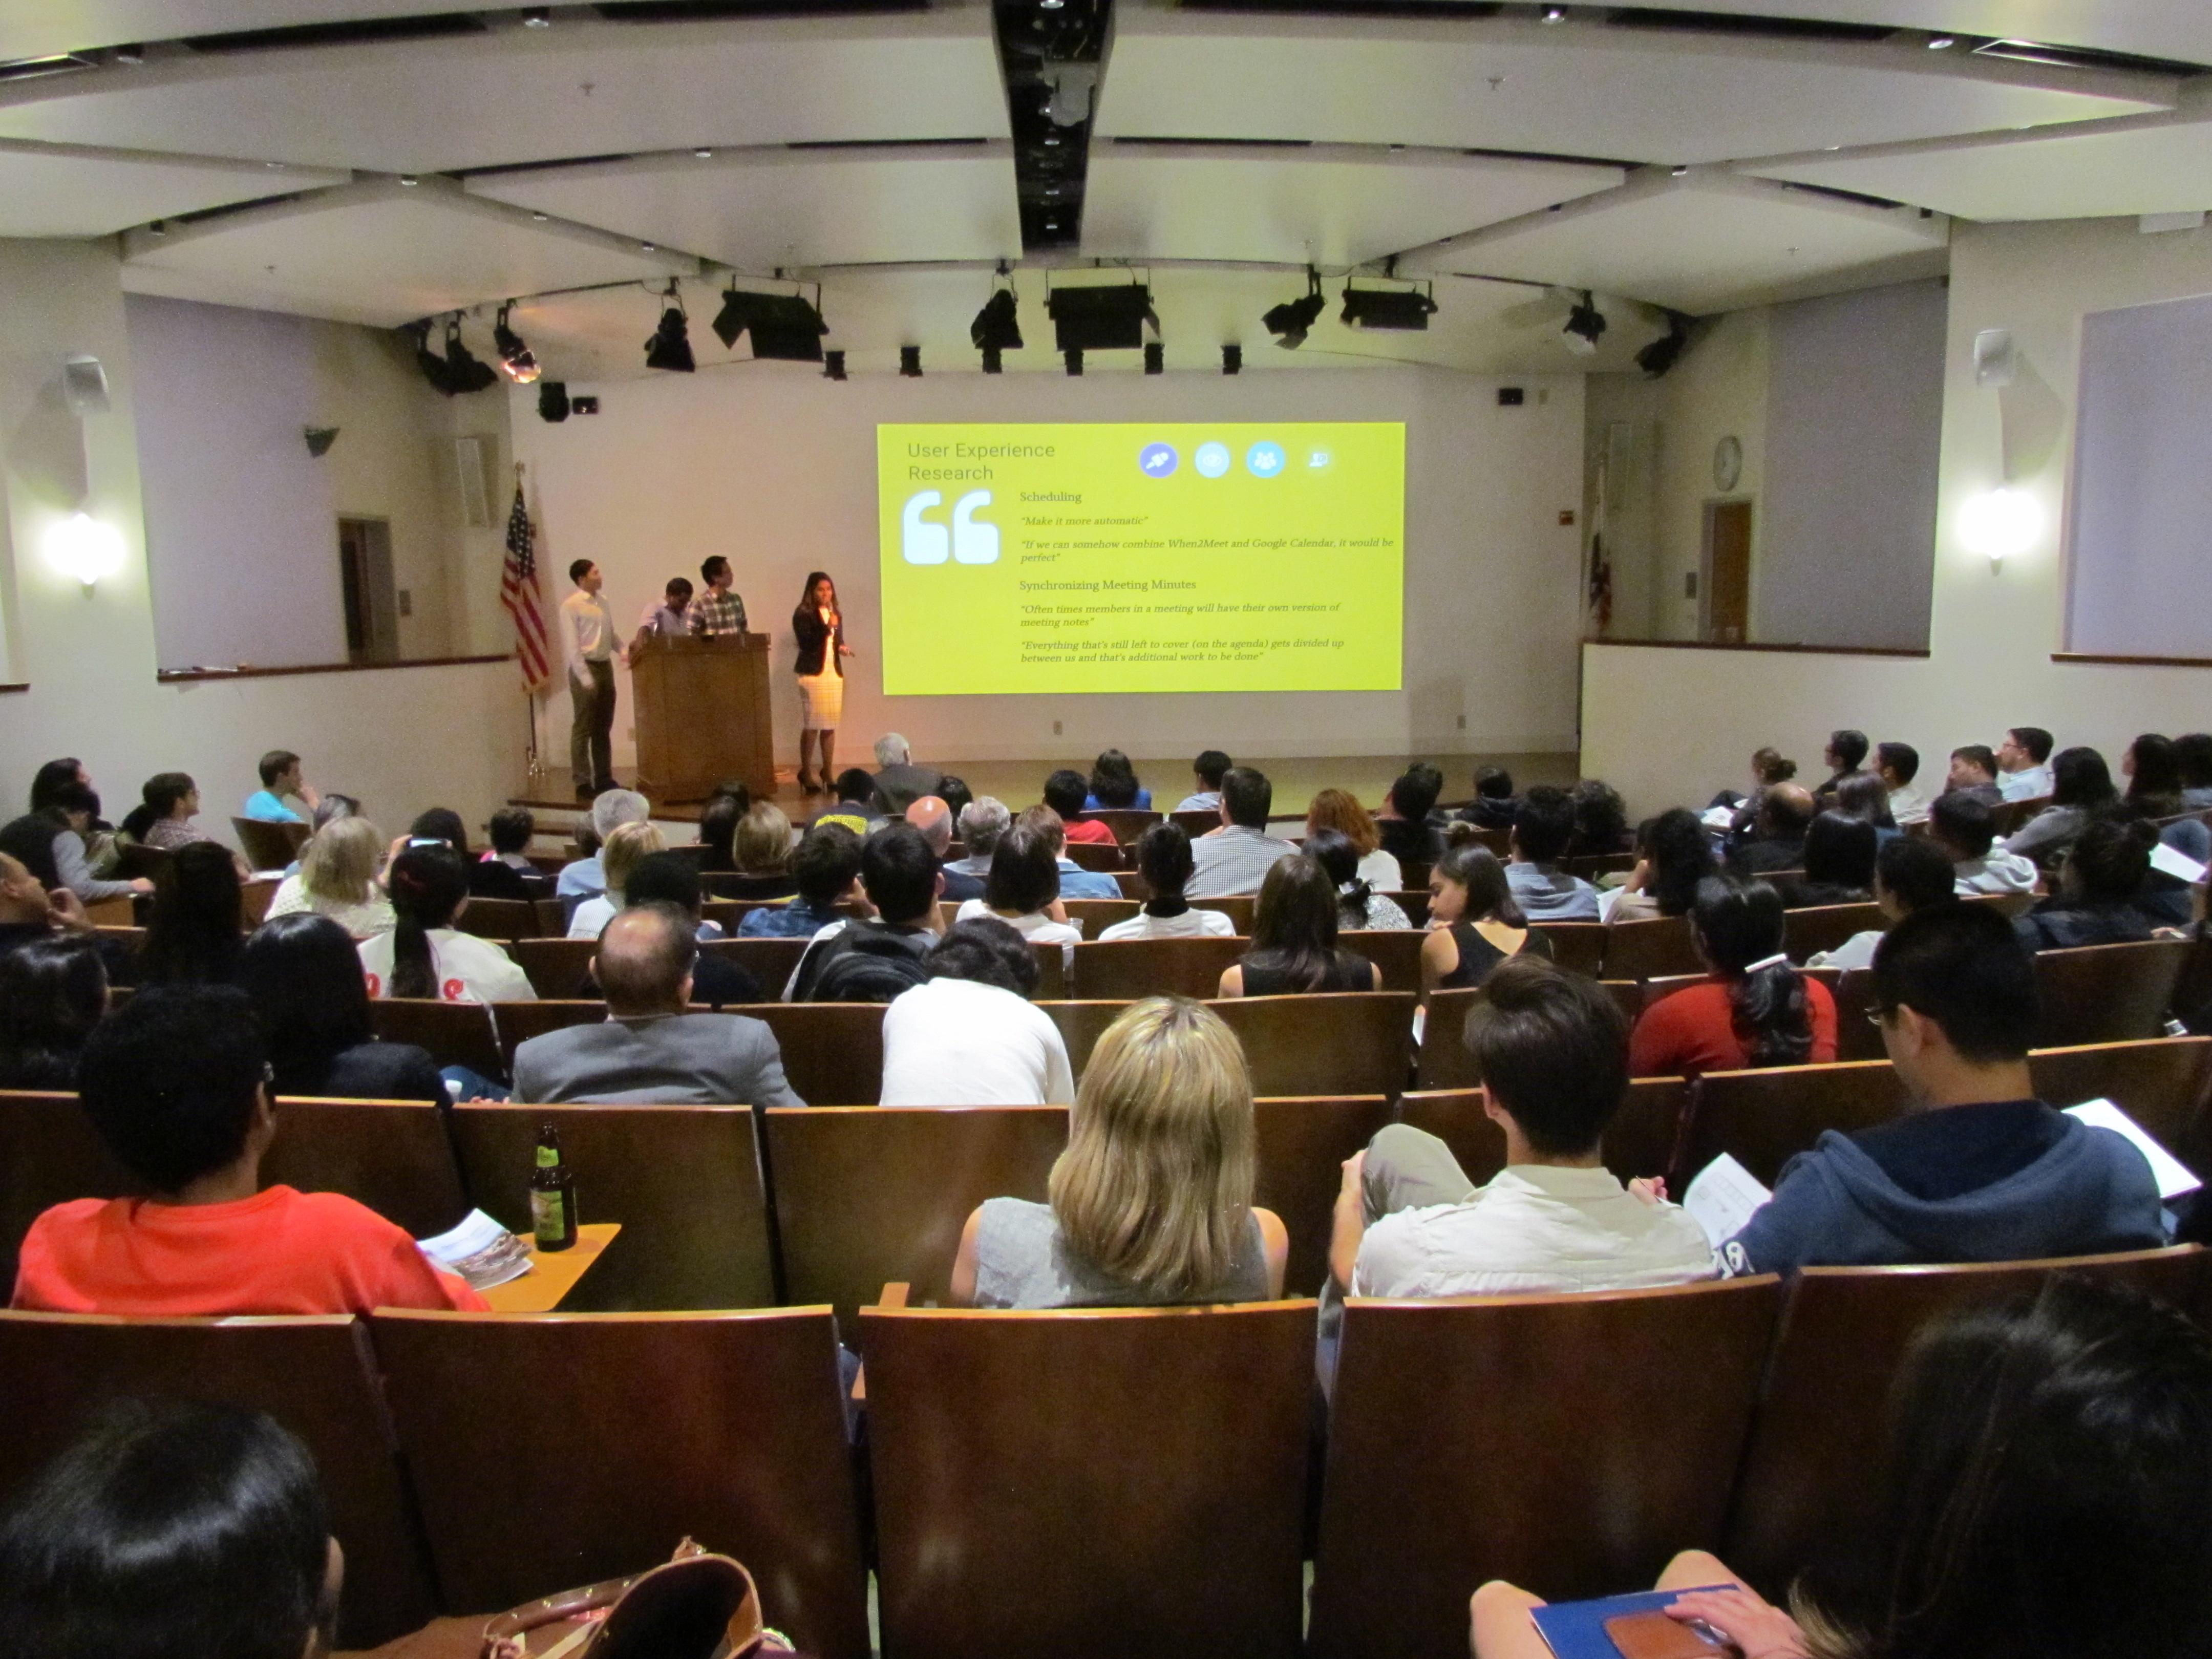 Uc Berkeley Events Calendar: Mims Final Project Showcase regarding Uc Berkeley Academic Calendar 2017